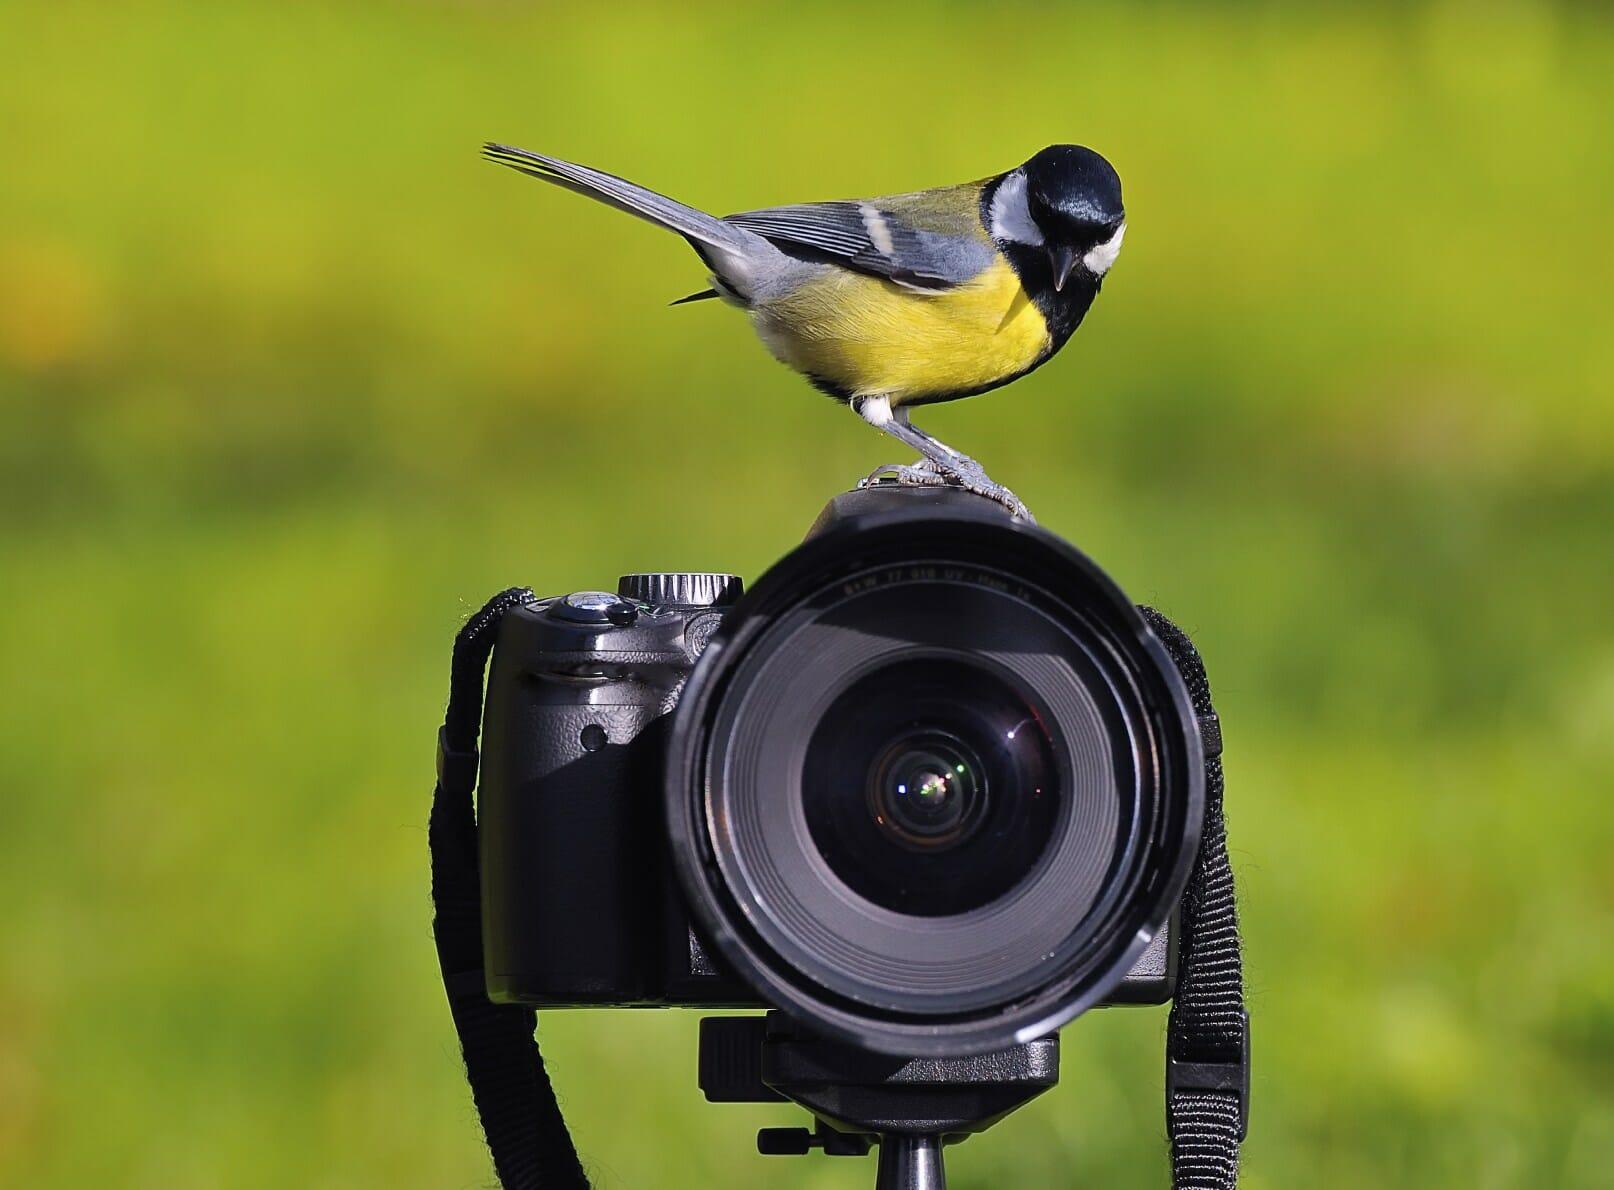 bird on camera